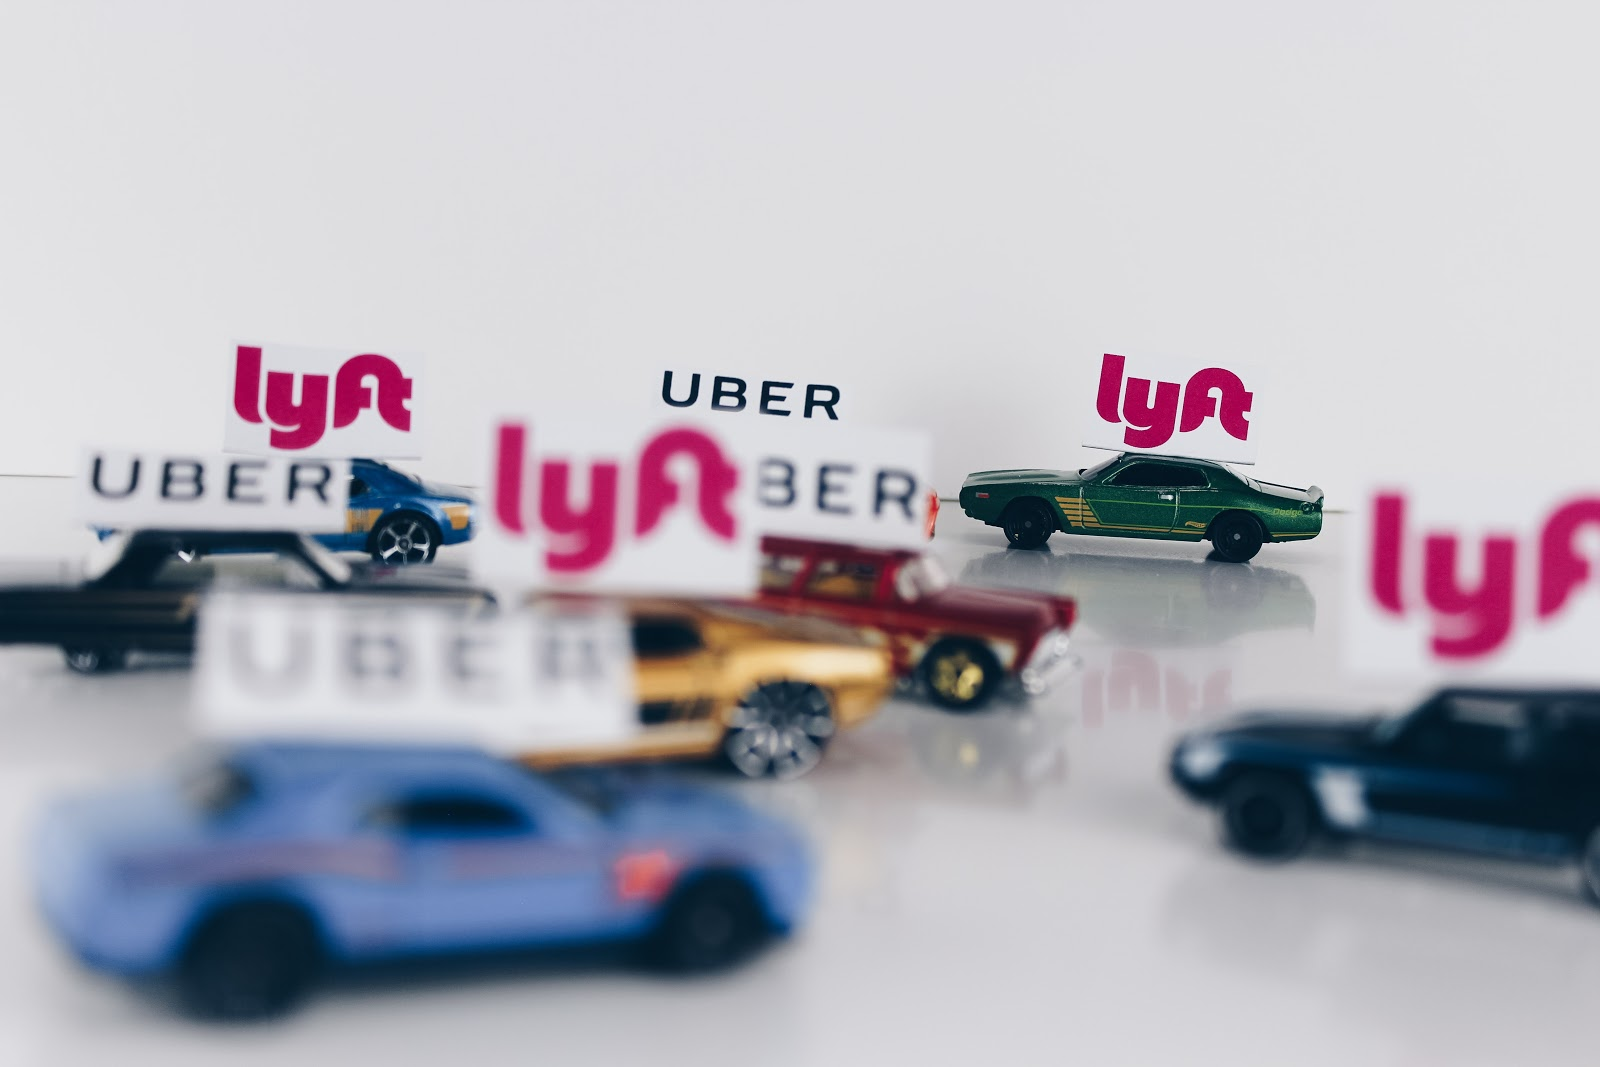 Uber, Lyft, 99/Didi e similares